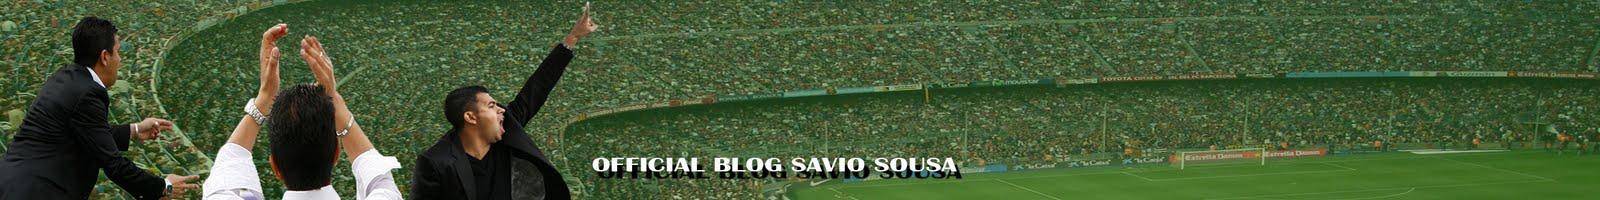 Savio Sousa